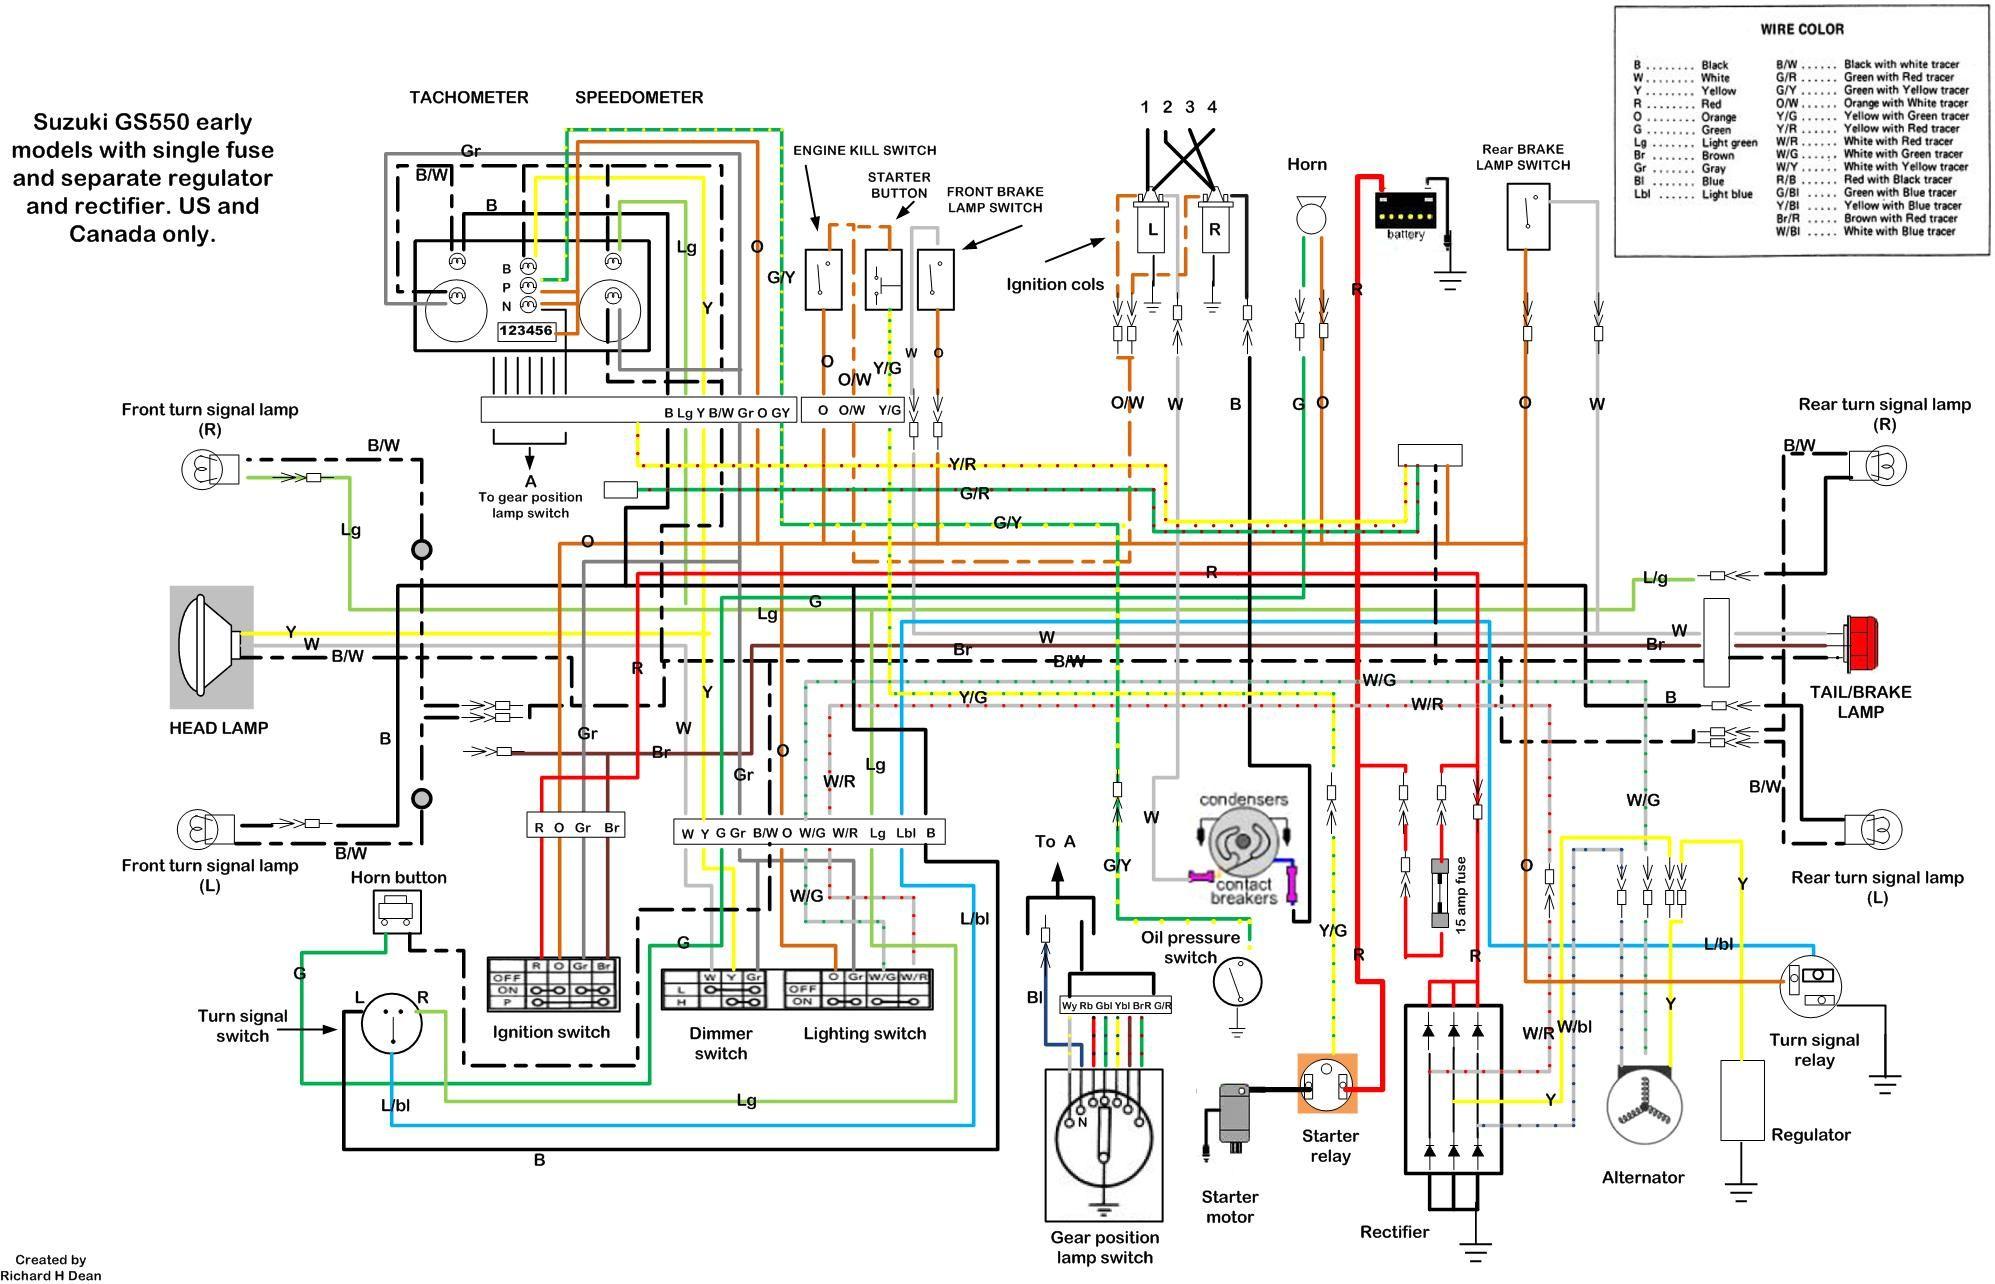 1978 Gs550 Wiring Diagram